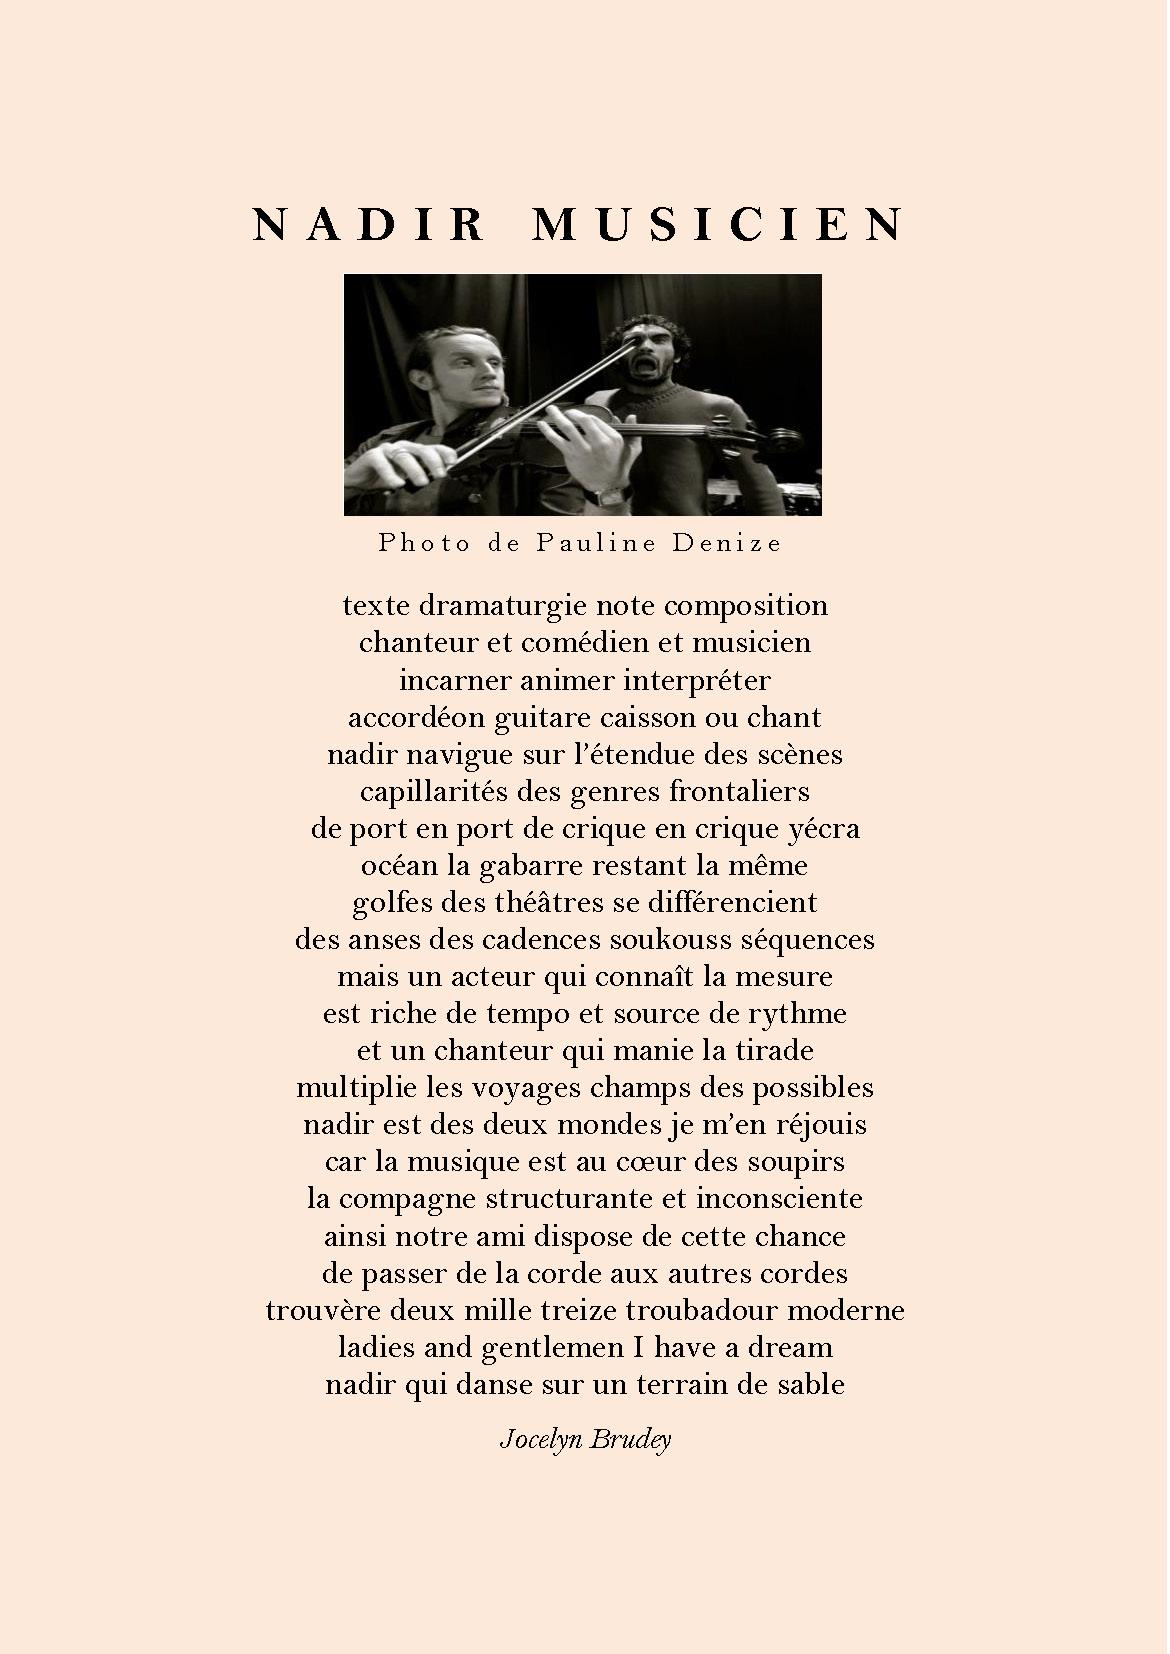 Nadir musicien jocelyn brudey juillet 2013